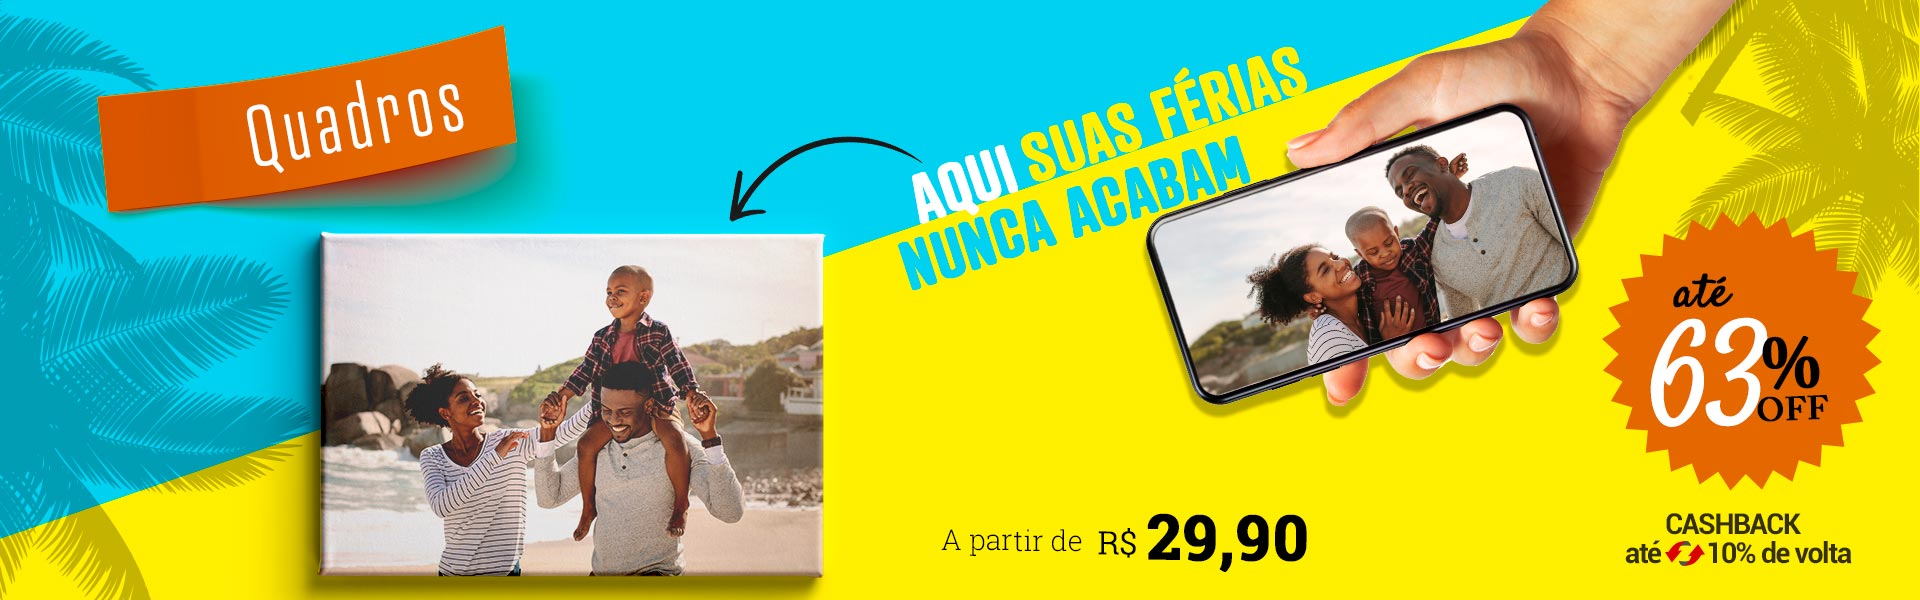 Foto quadros - Phooto Brasil